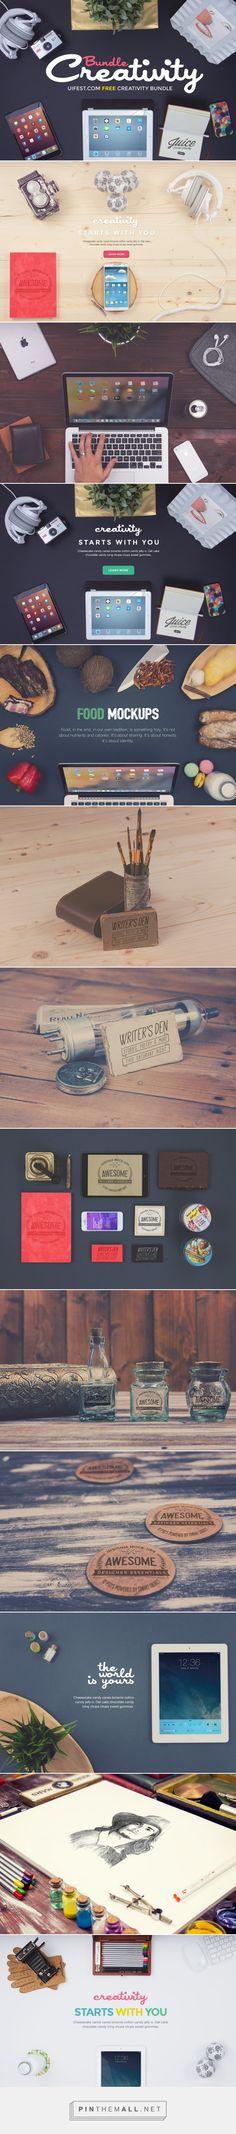 GraphicsFuel |  Premium & Free Graphic & Web Design Resources!   –  Free Creativity Mockups Bundle - created via http://pinthemall.net